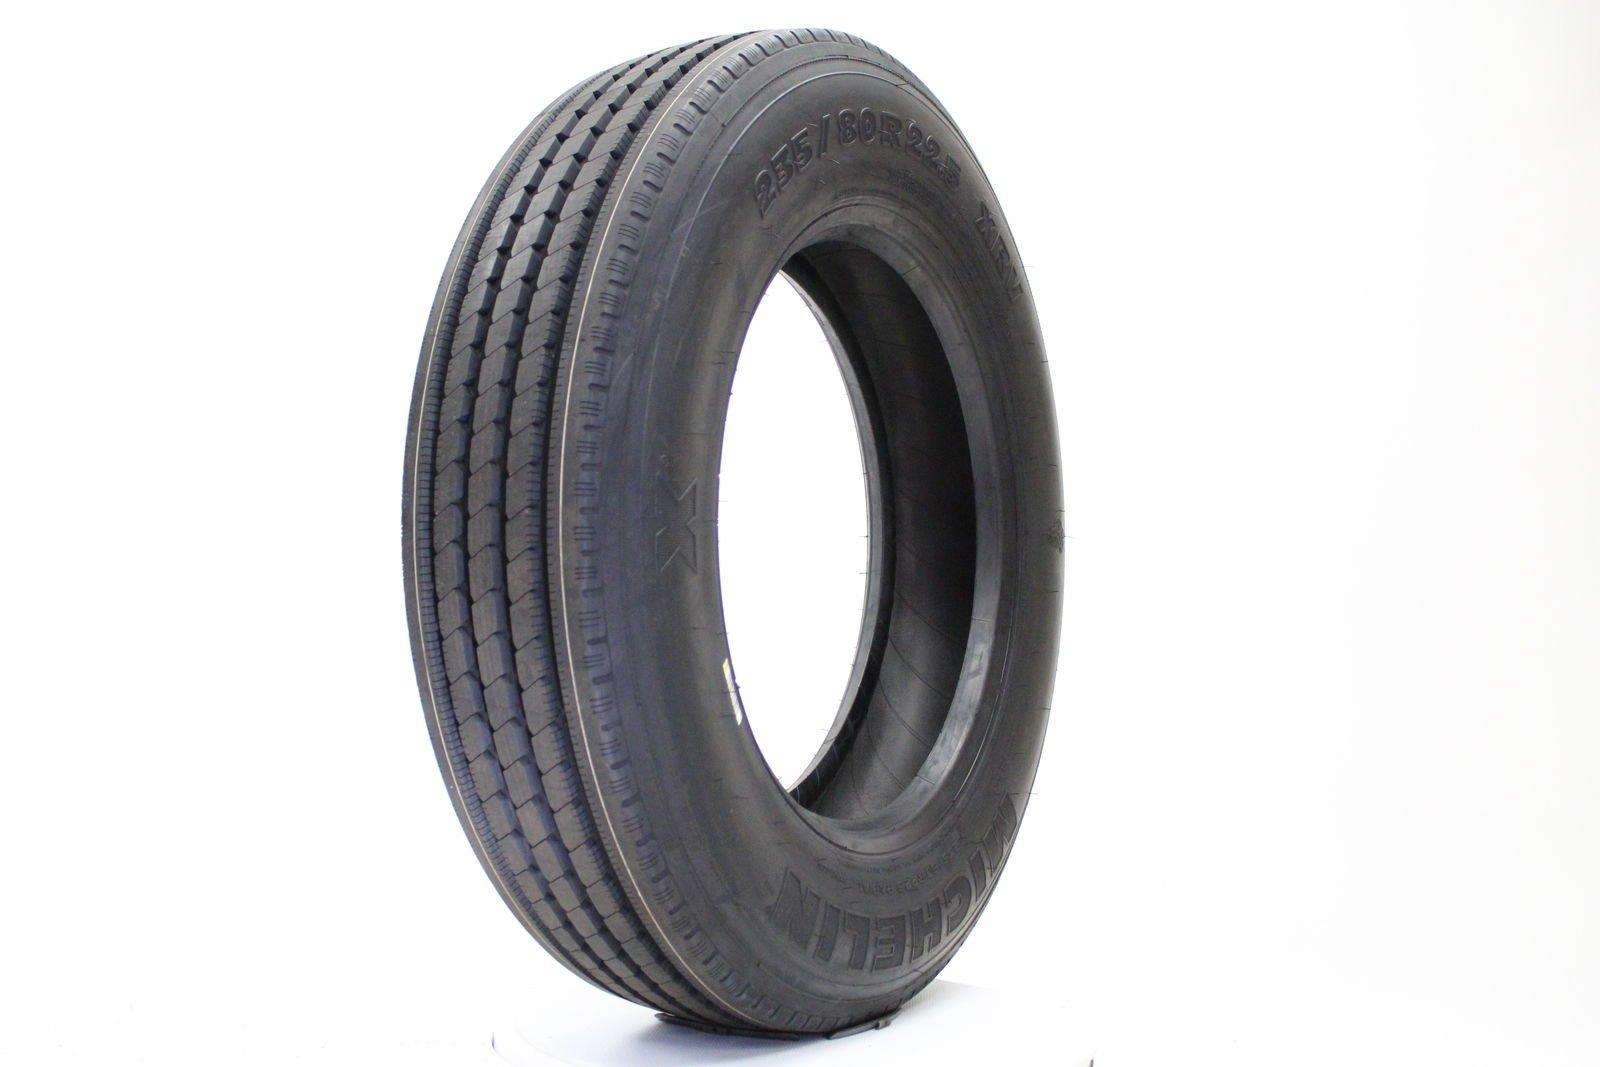 Michelin XRV Commercial-Truck Tire - 255/80R22.5